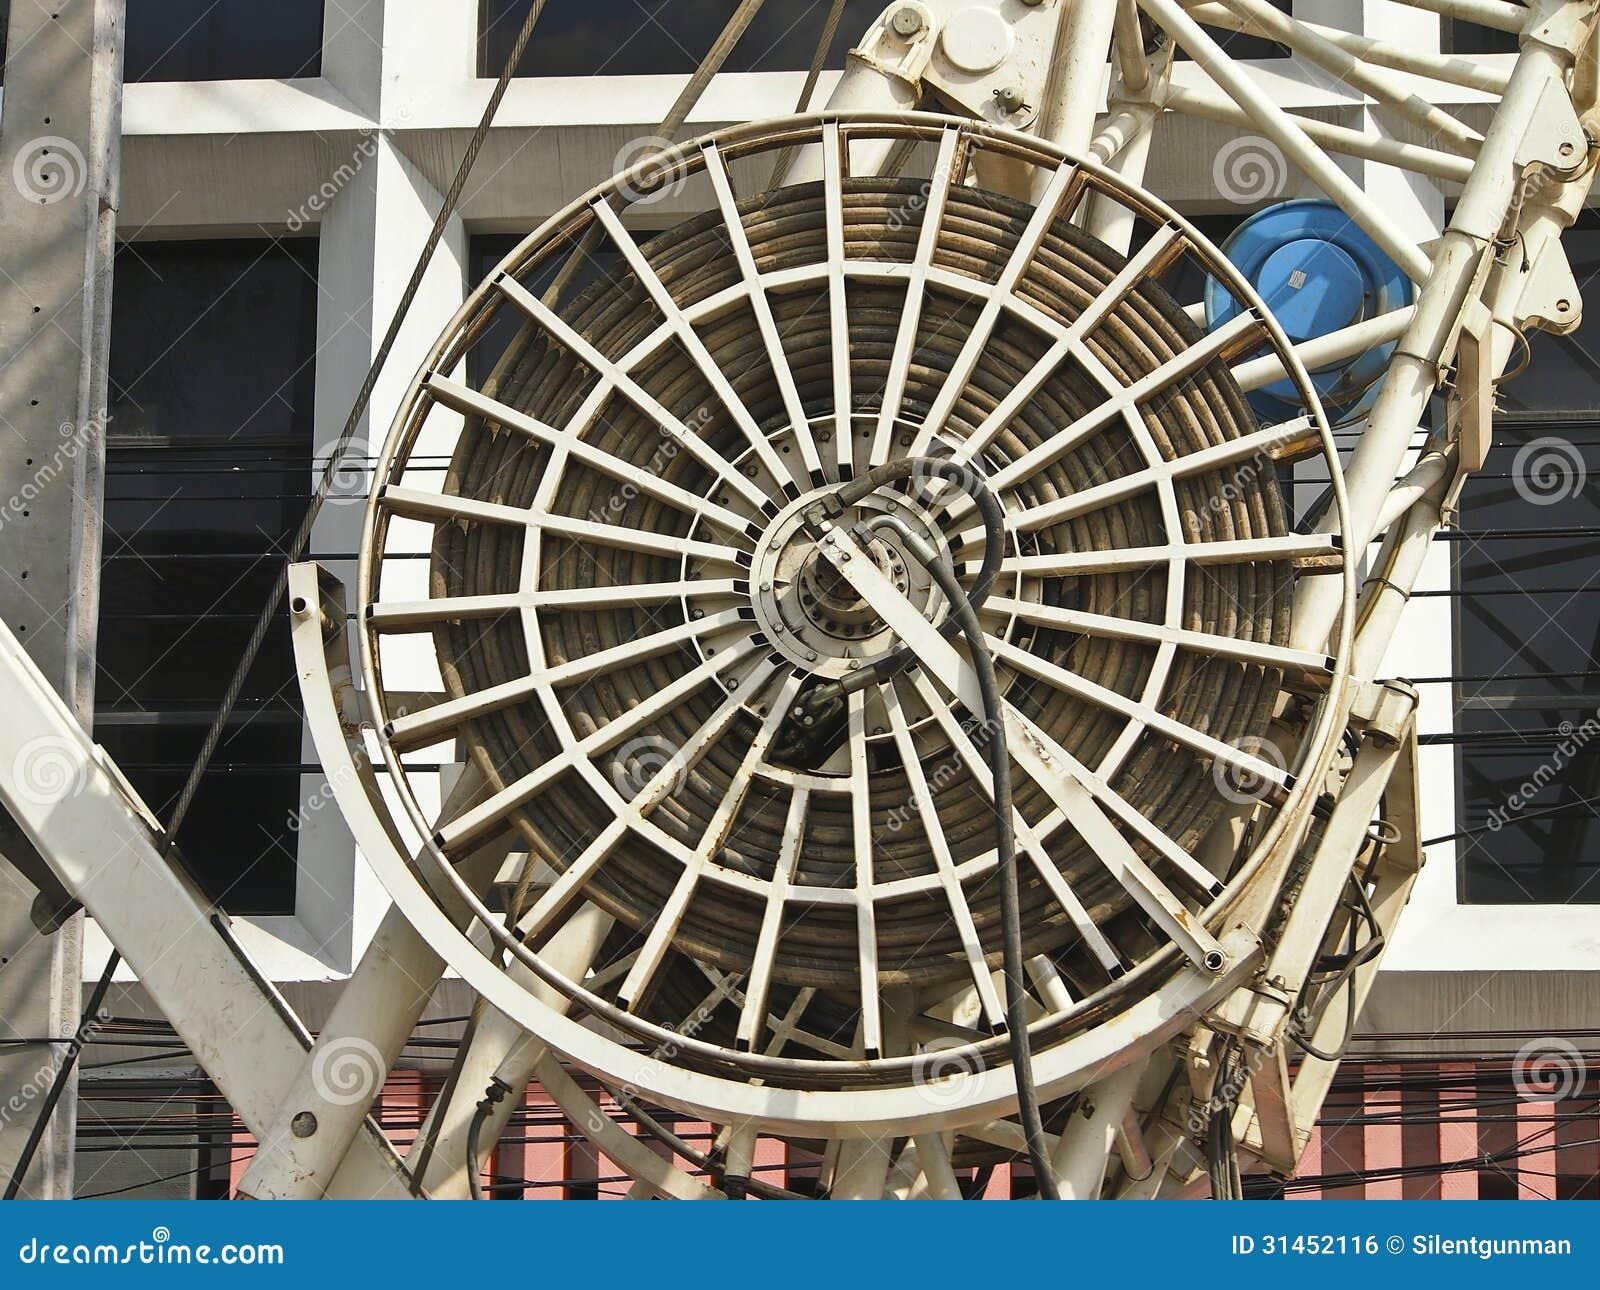 Hydraulic Wheel Drive System : Hydraulic wheel royalty free stock image